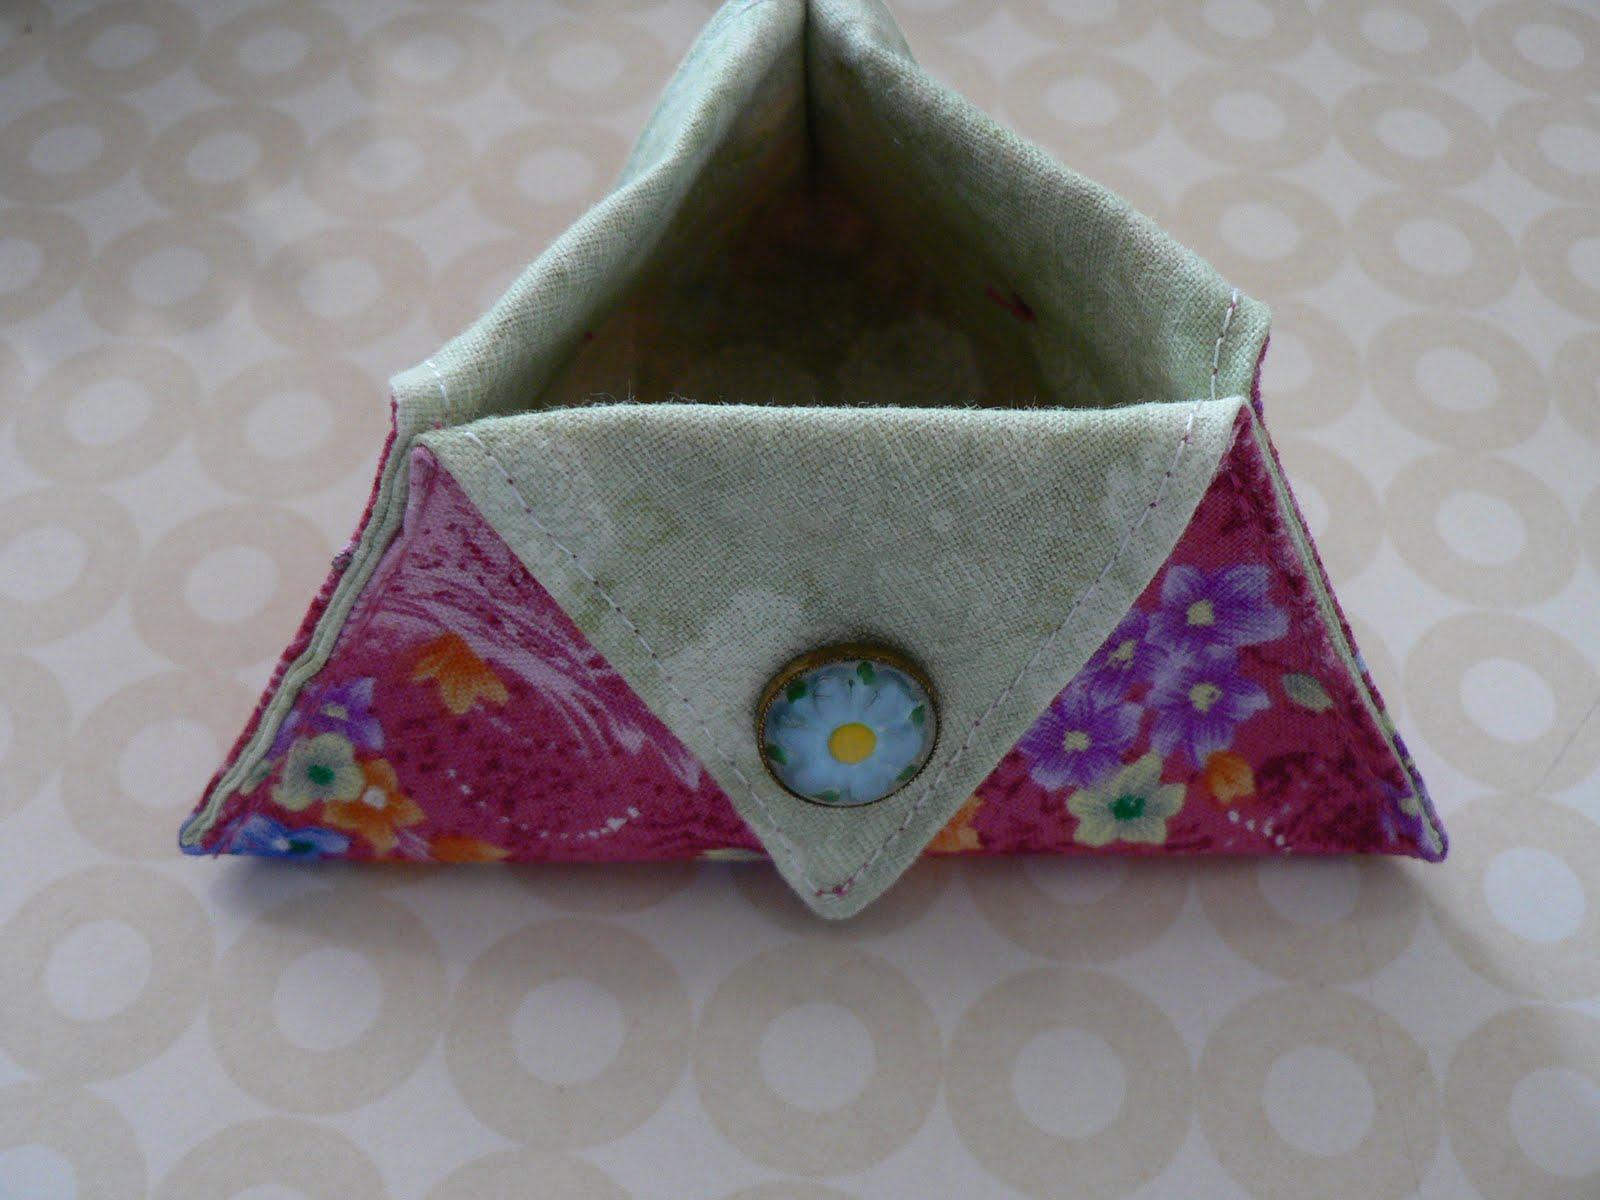 Needling Things Triangular Thread Catcher Tutorial